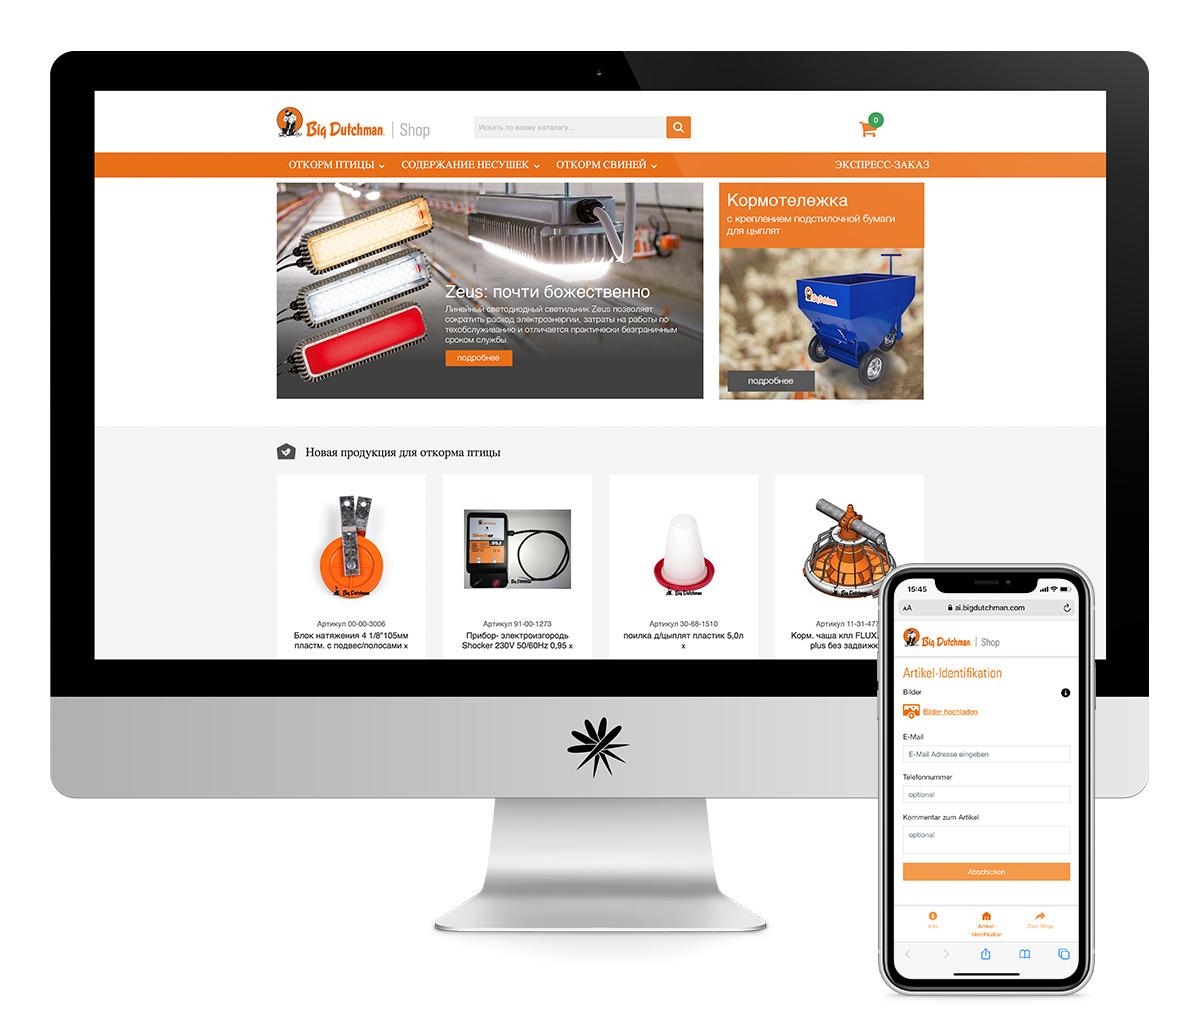 Projekt Big Dutchman Webshop und PWA